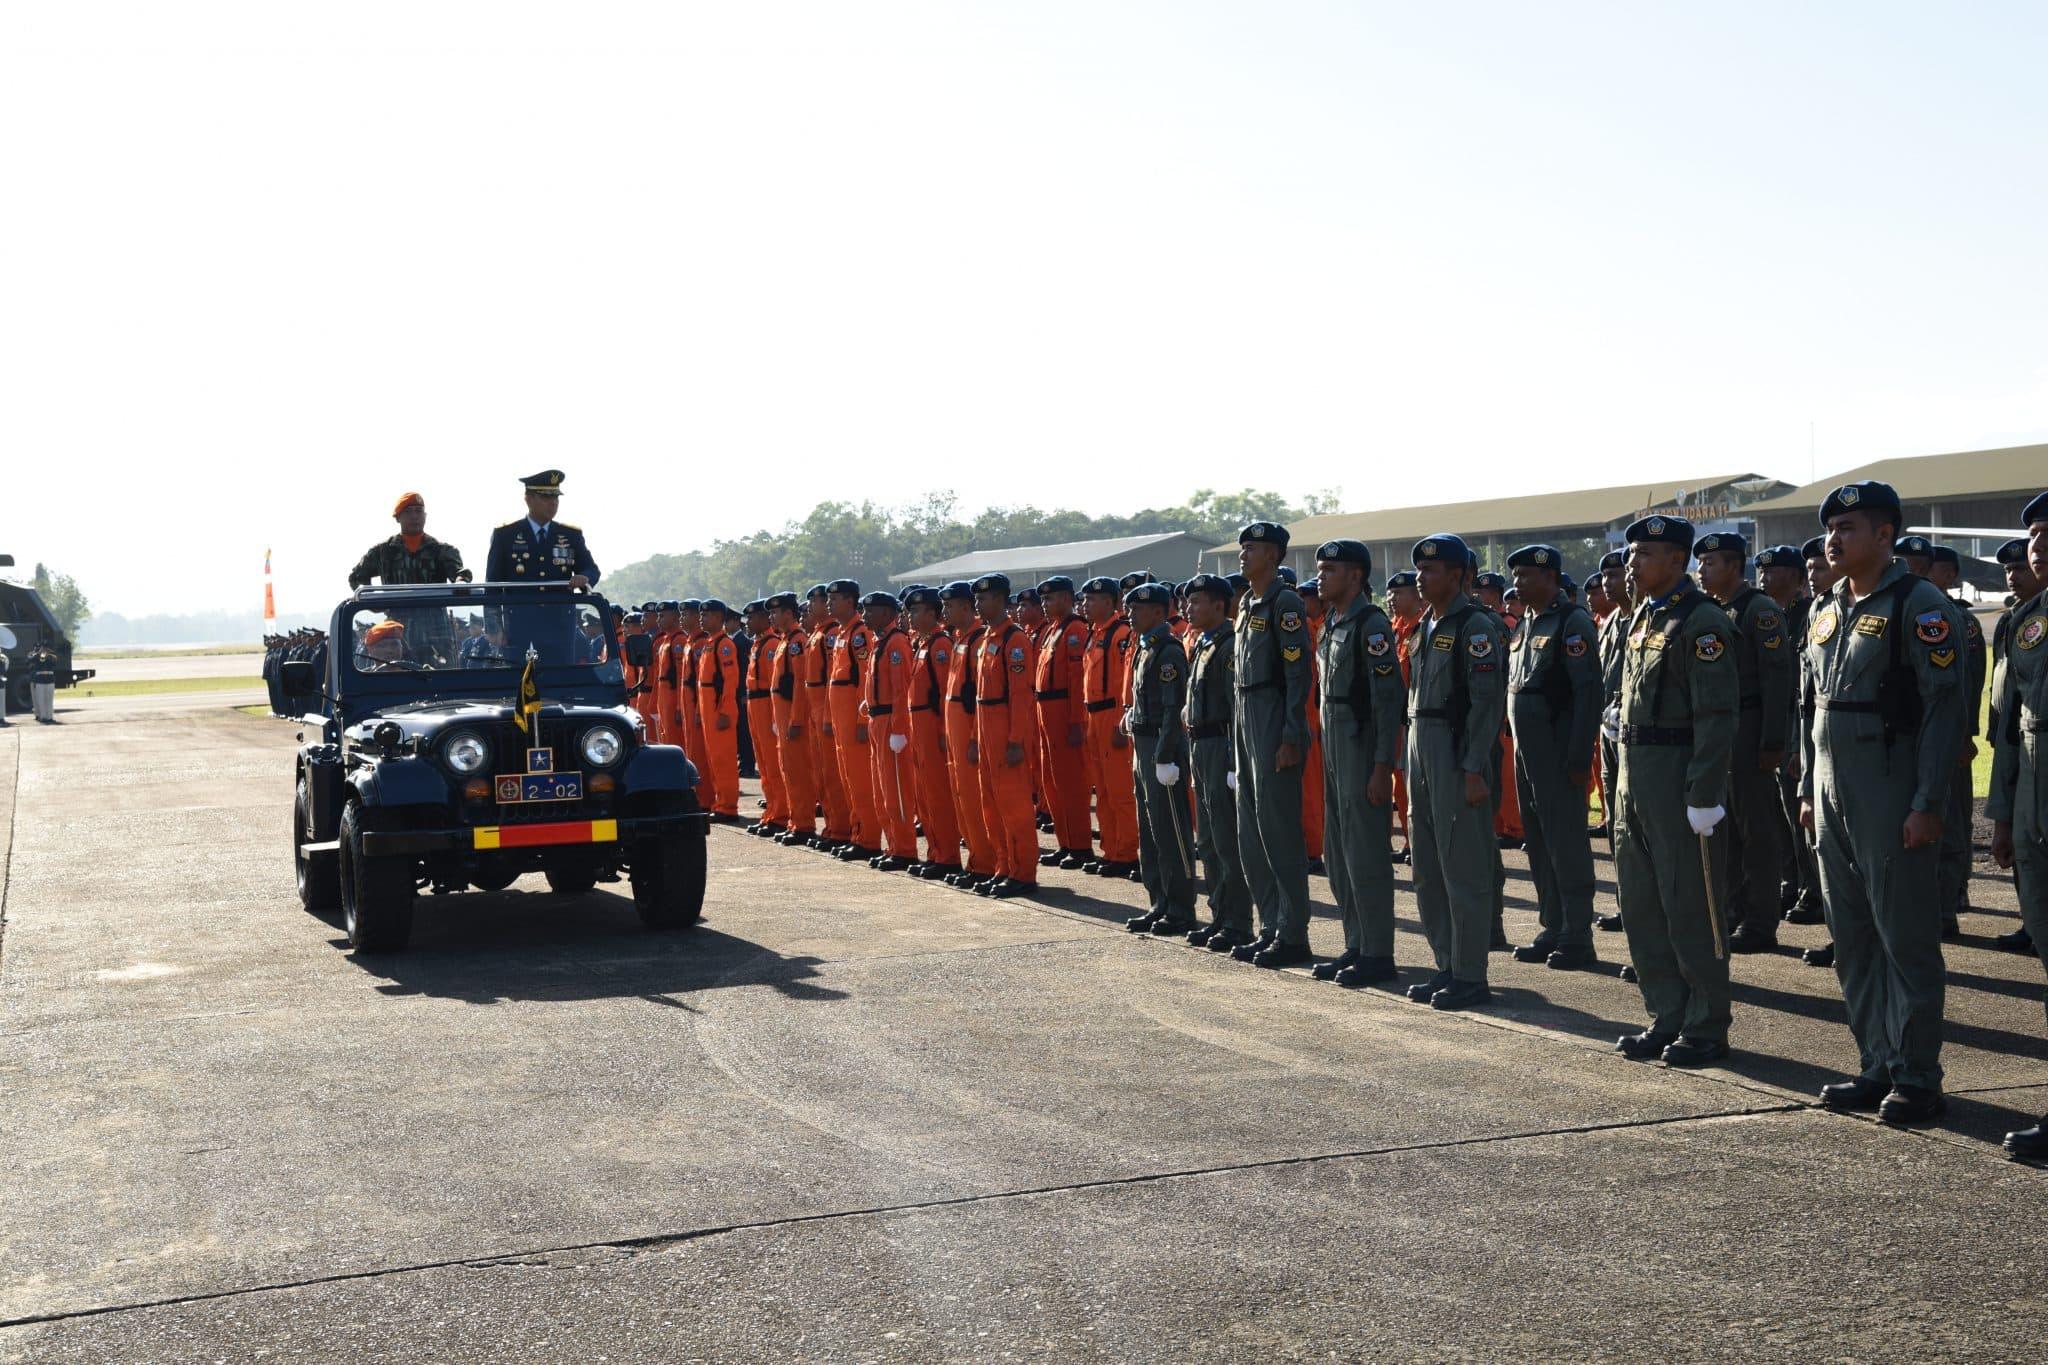 TNI Angkatan Udara Tetap Memiliki Tekad Dan Komitmen Yang Kuat